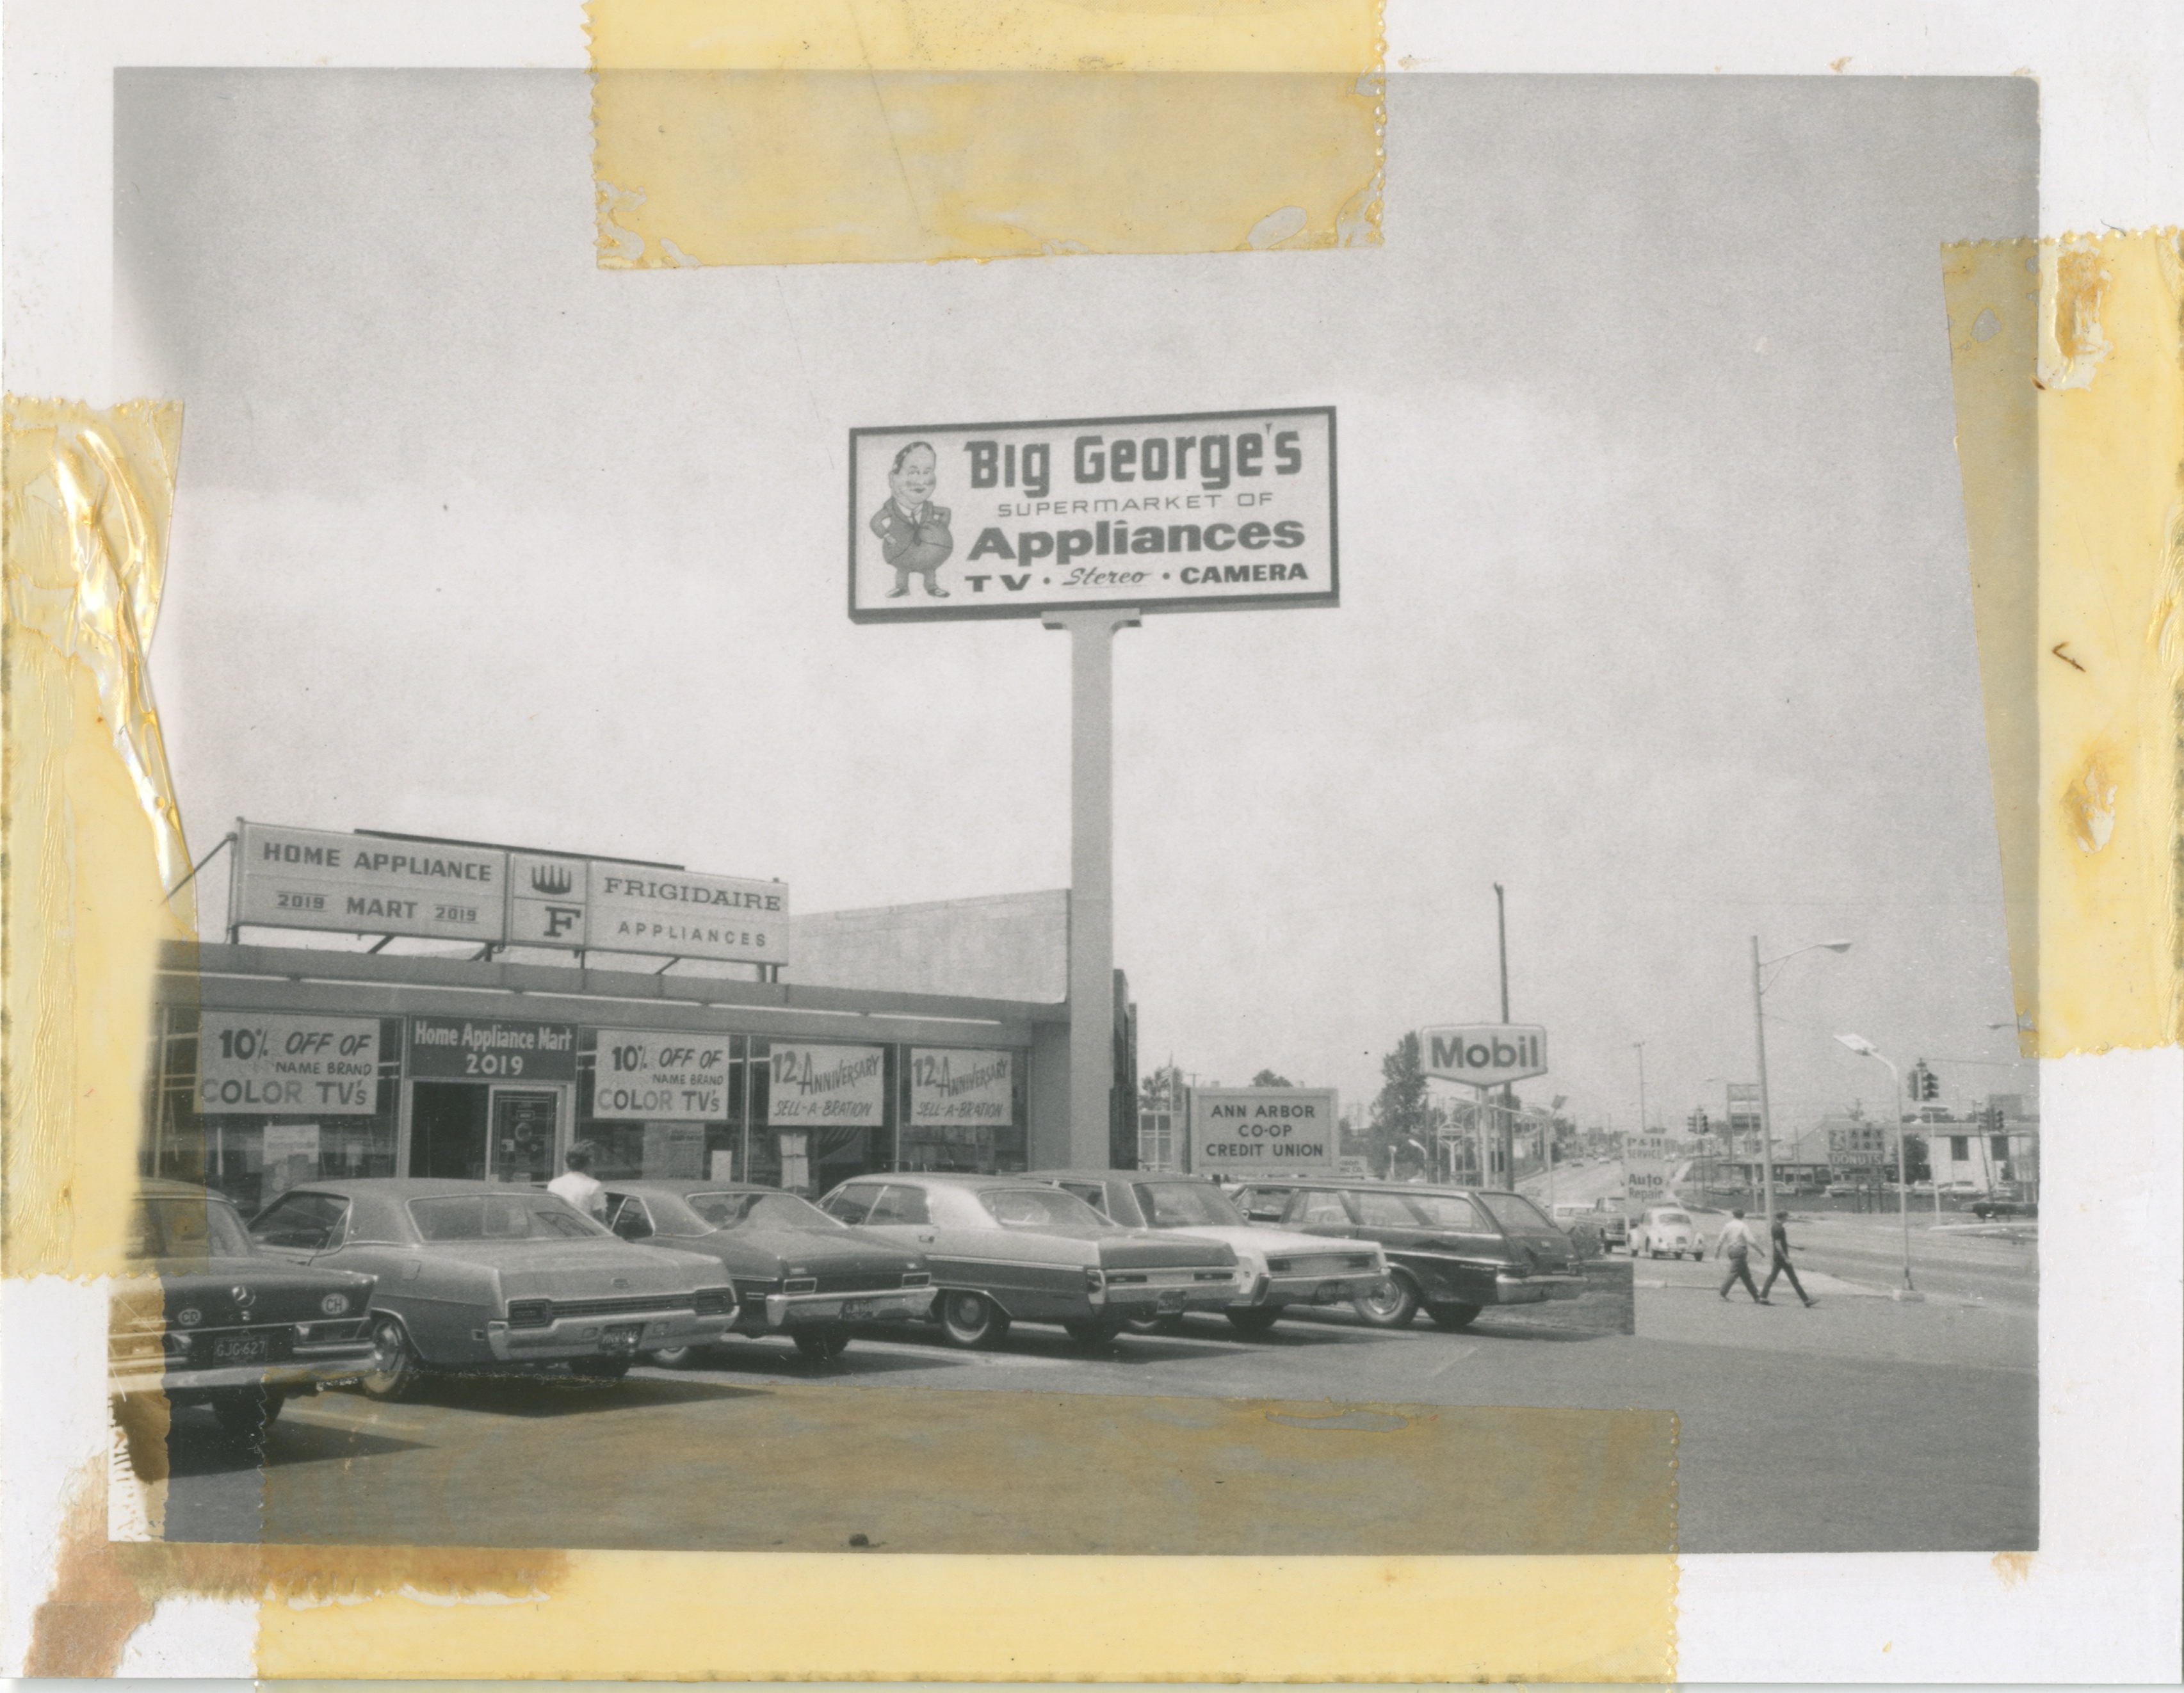 Big Georges Supermarket Of Appliances 1971 Ann Arbor District Library